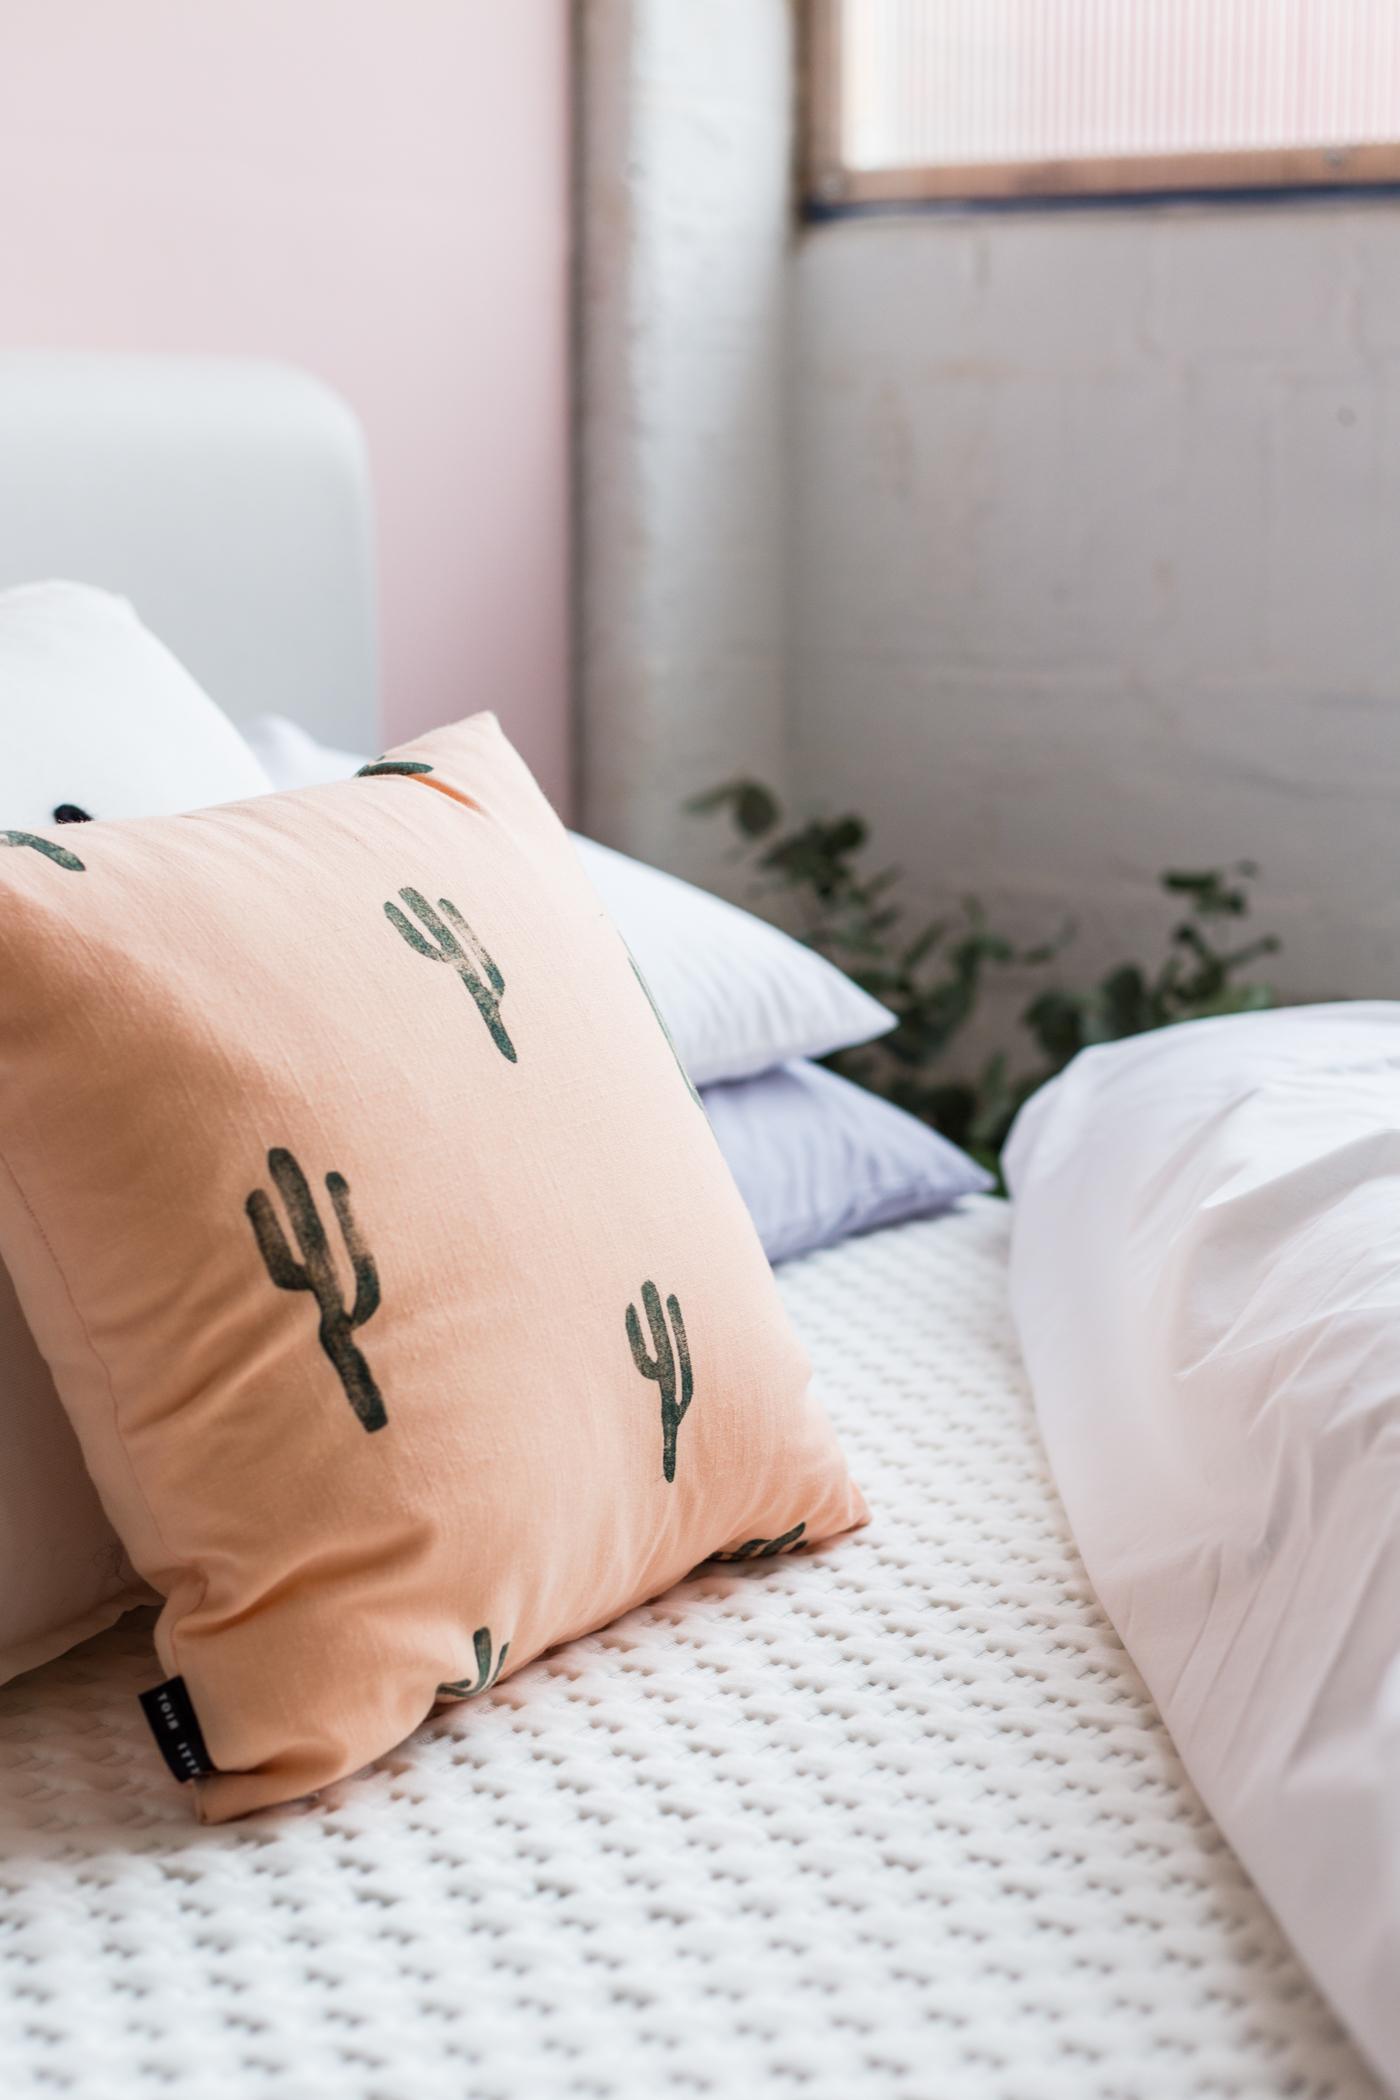 Get a Silentnight Sleep with Studio